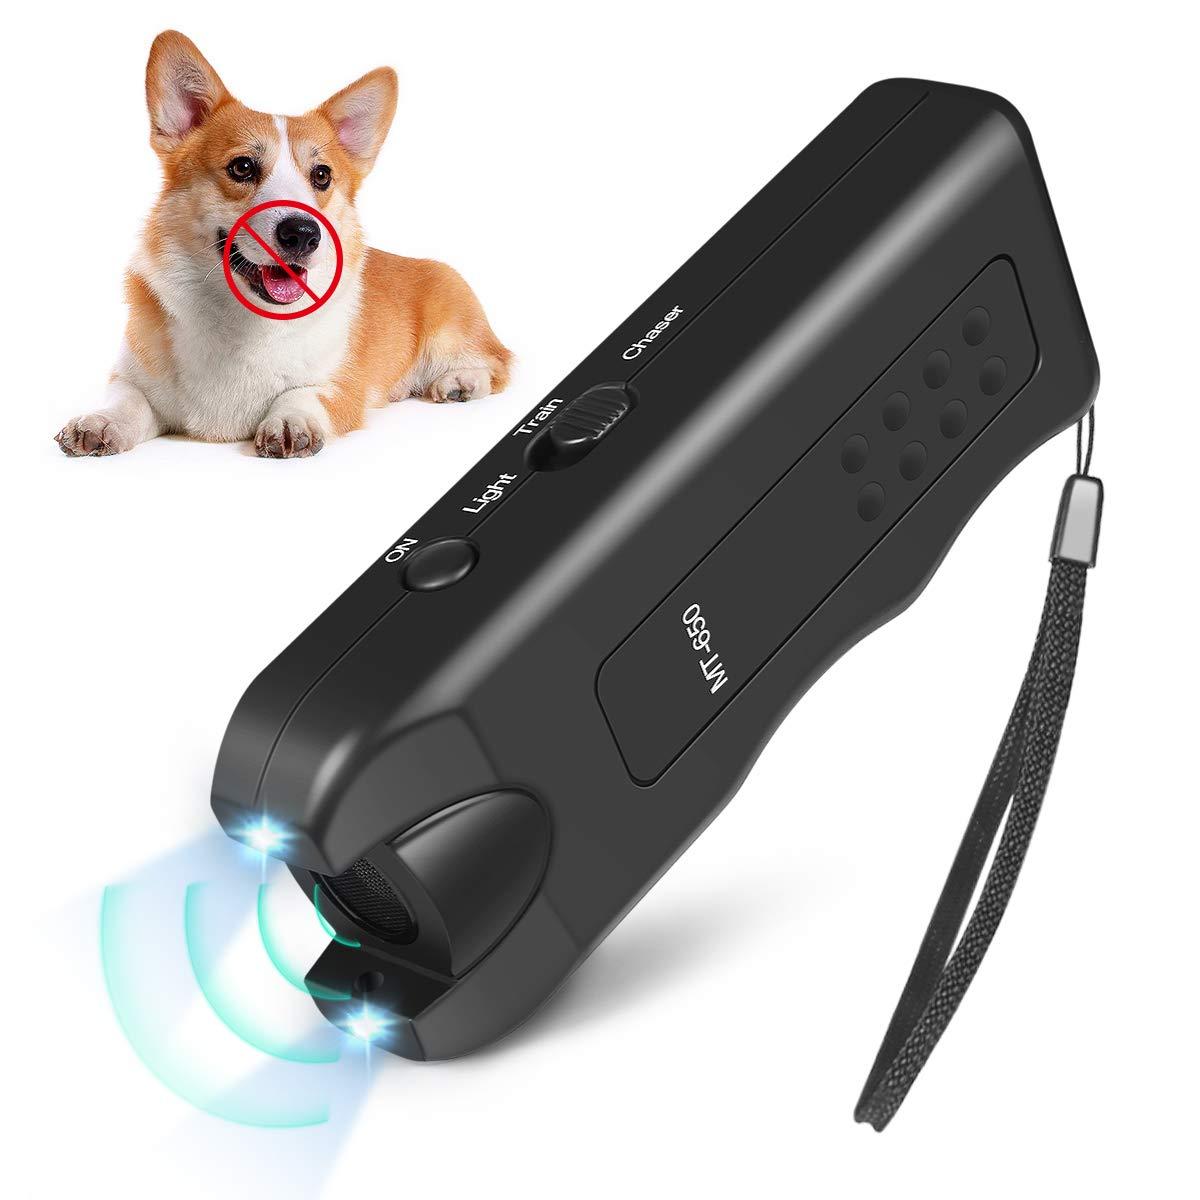 Handheld Dog Repellent, Ultrasonic Infrared Dog Deterrent, Bark Stopper + Good Behavior Dog Training by Quenta